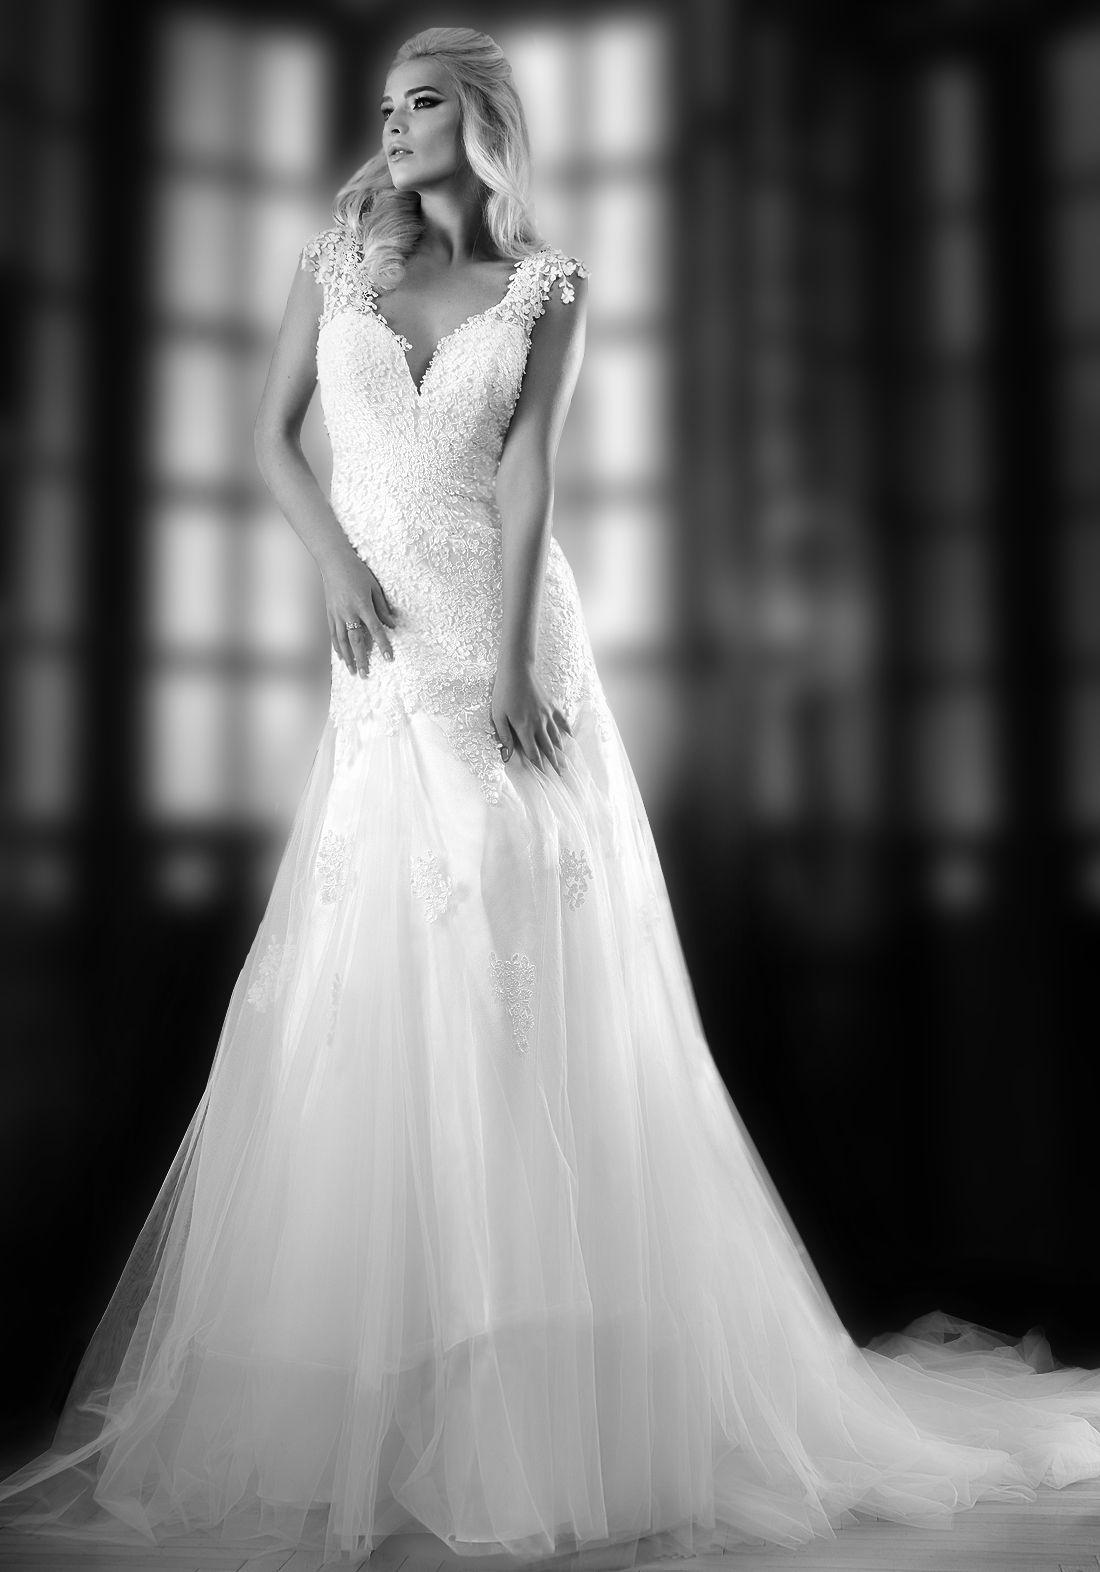 Sexy Bien Savvy Wedding Dresses 2014 Bridal Collection